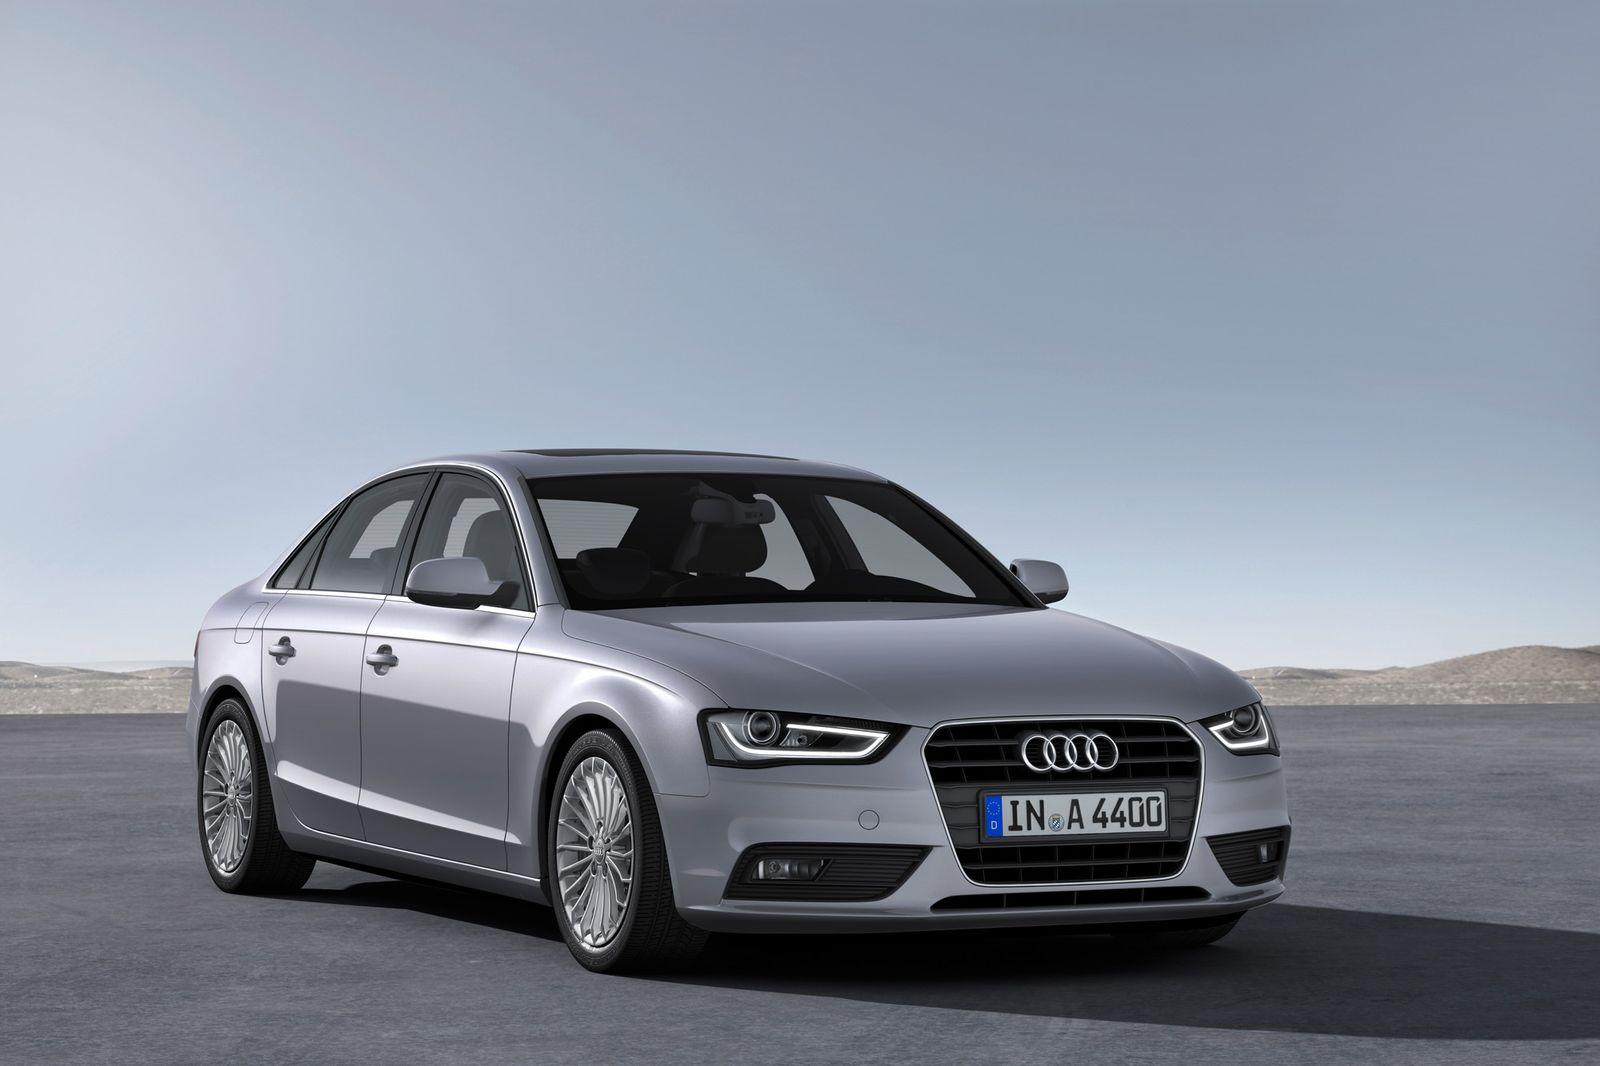 2014 / Audi A4